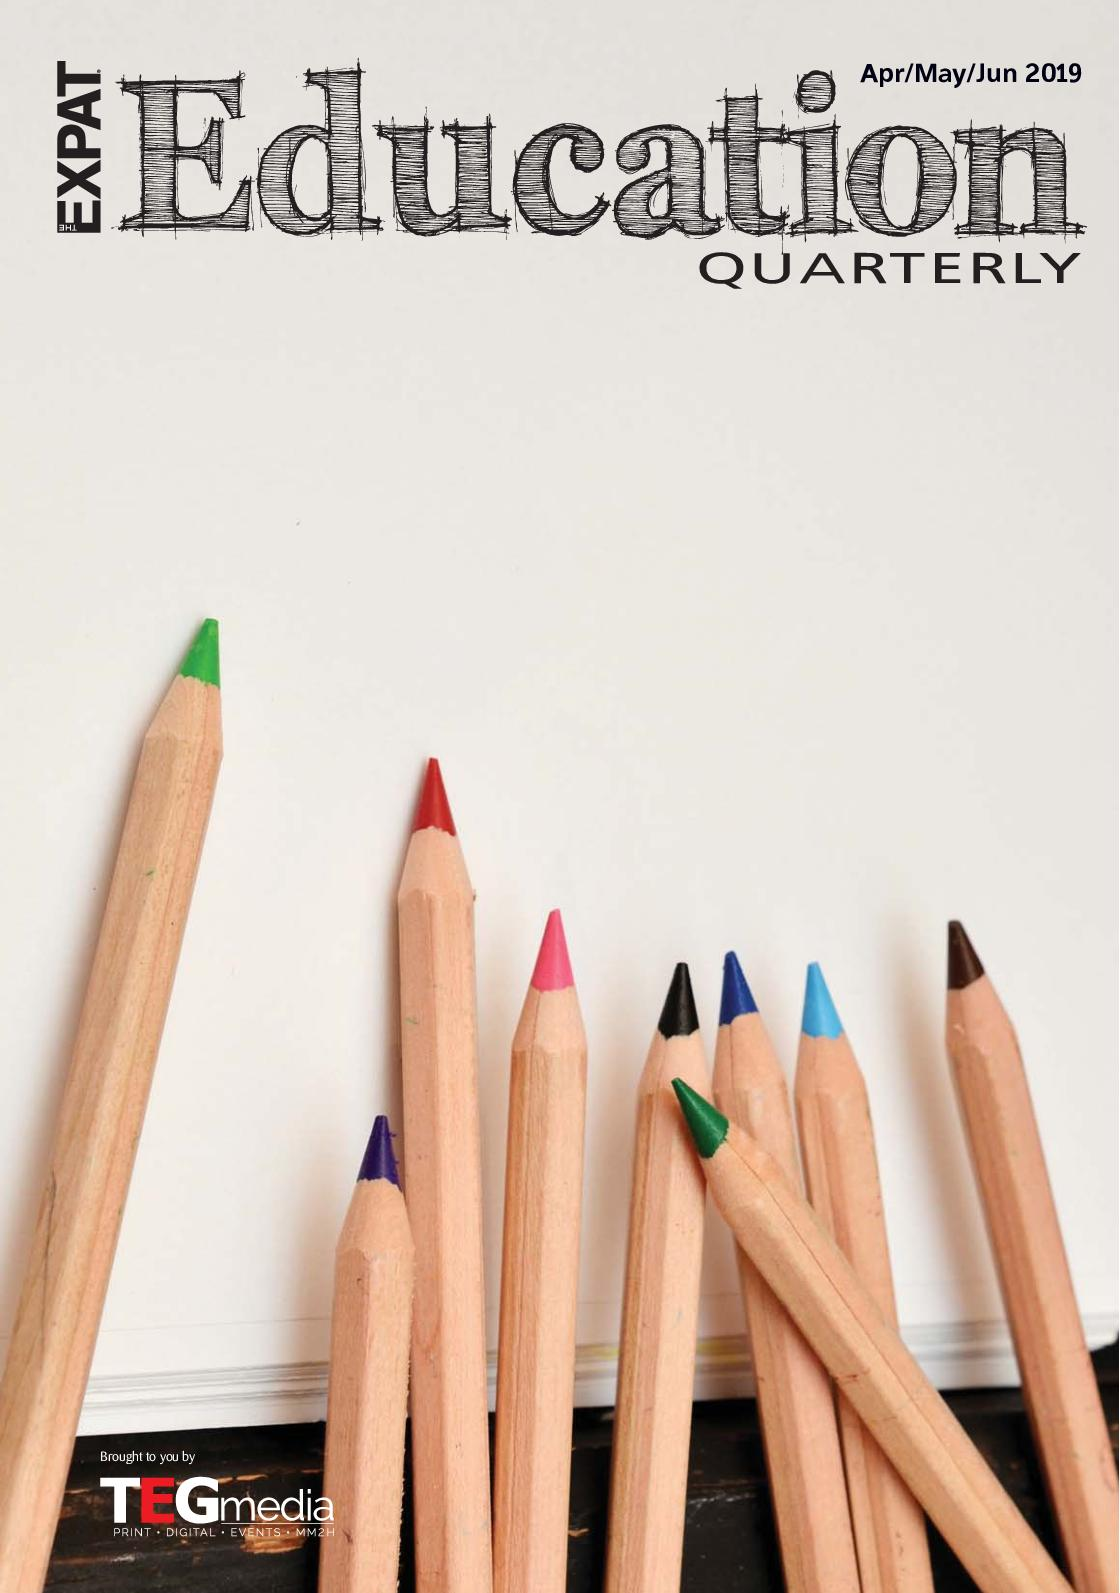 Calaméo - Expat Education Guide 2019 Q2 APR/MAY/JUN